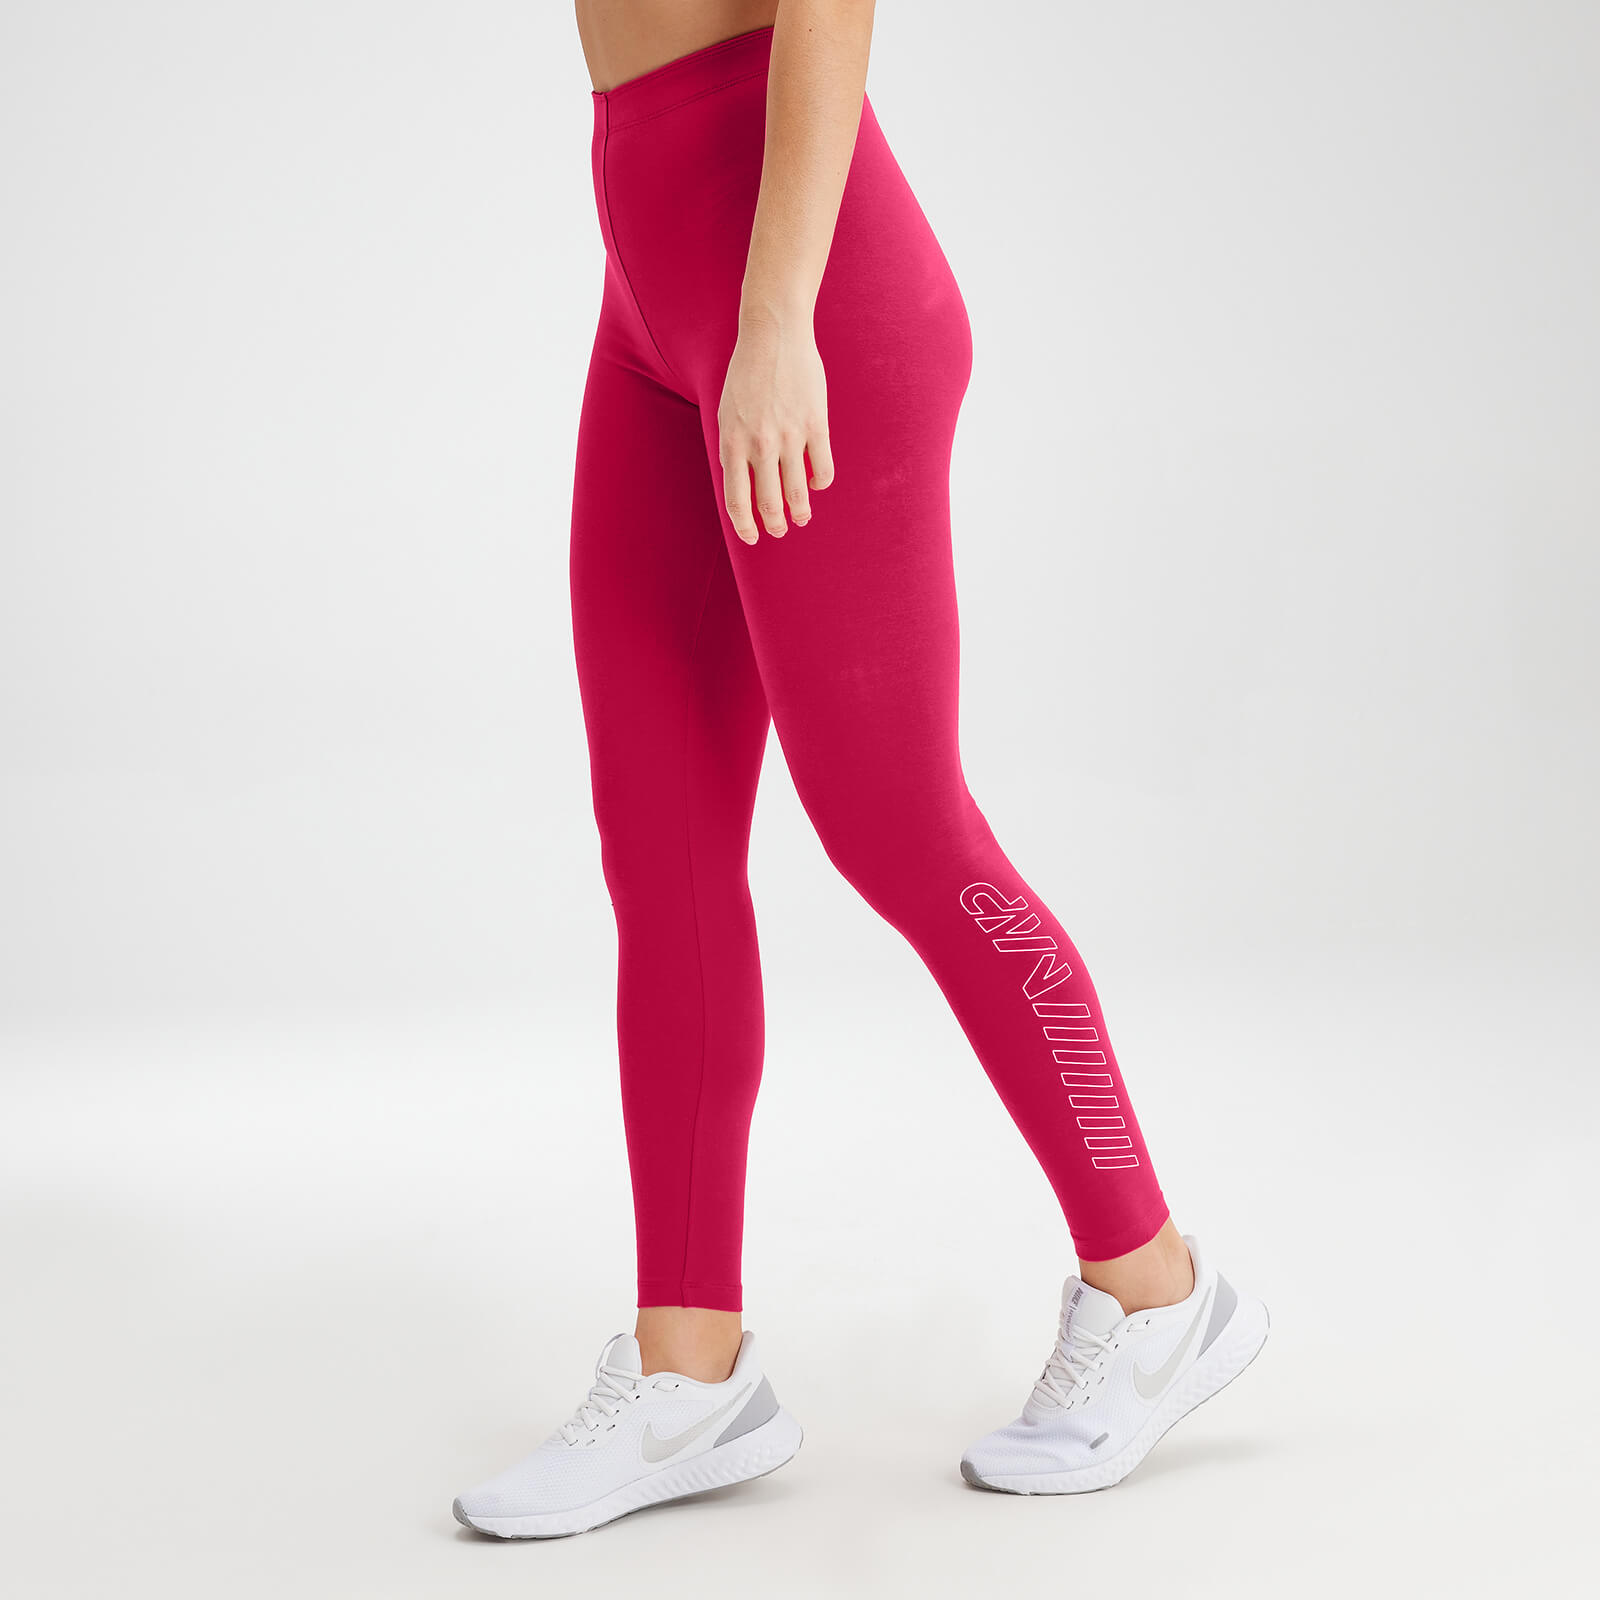 Купить MP Women's Outline Graphic Leggings - Virtual Pink - XXL, Myprotein International